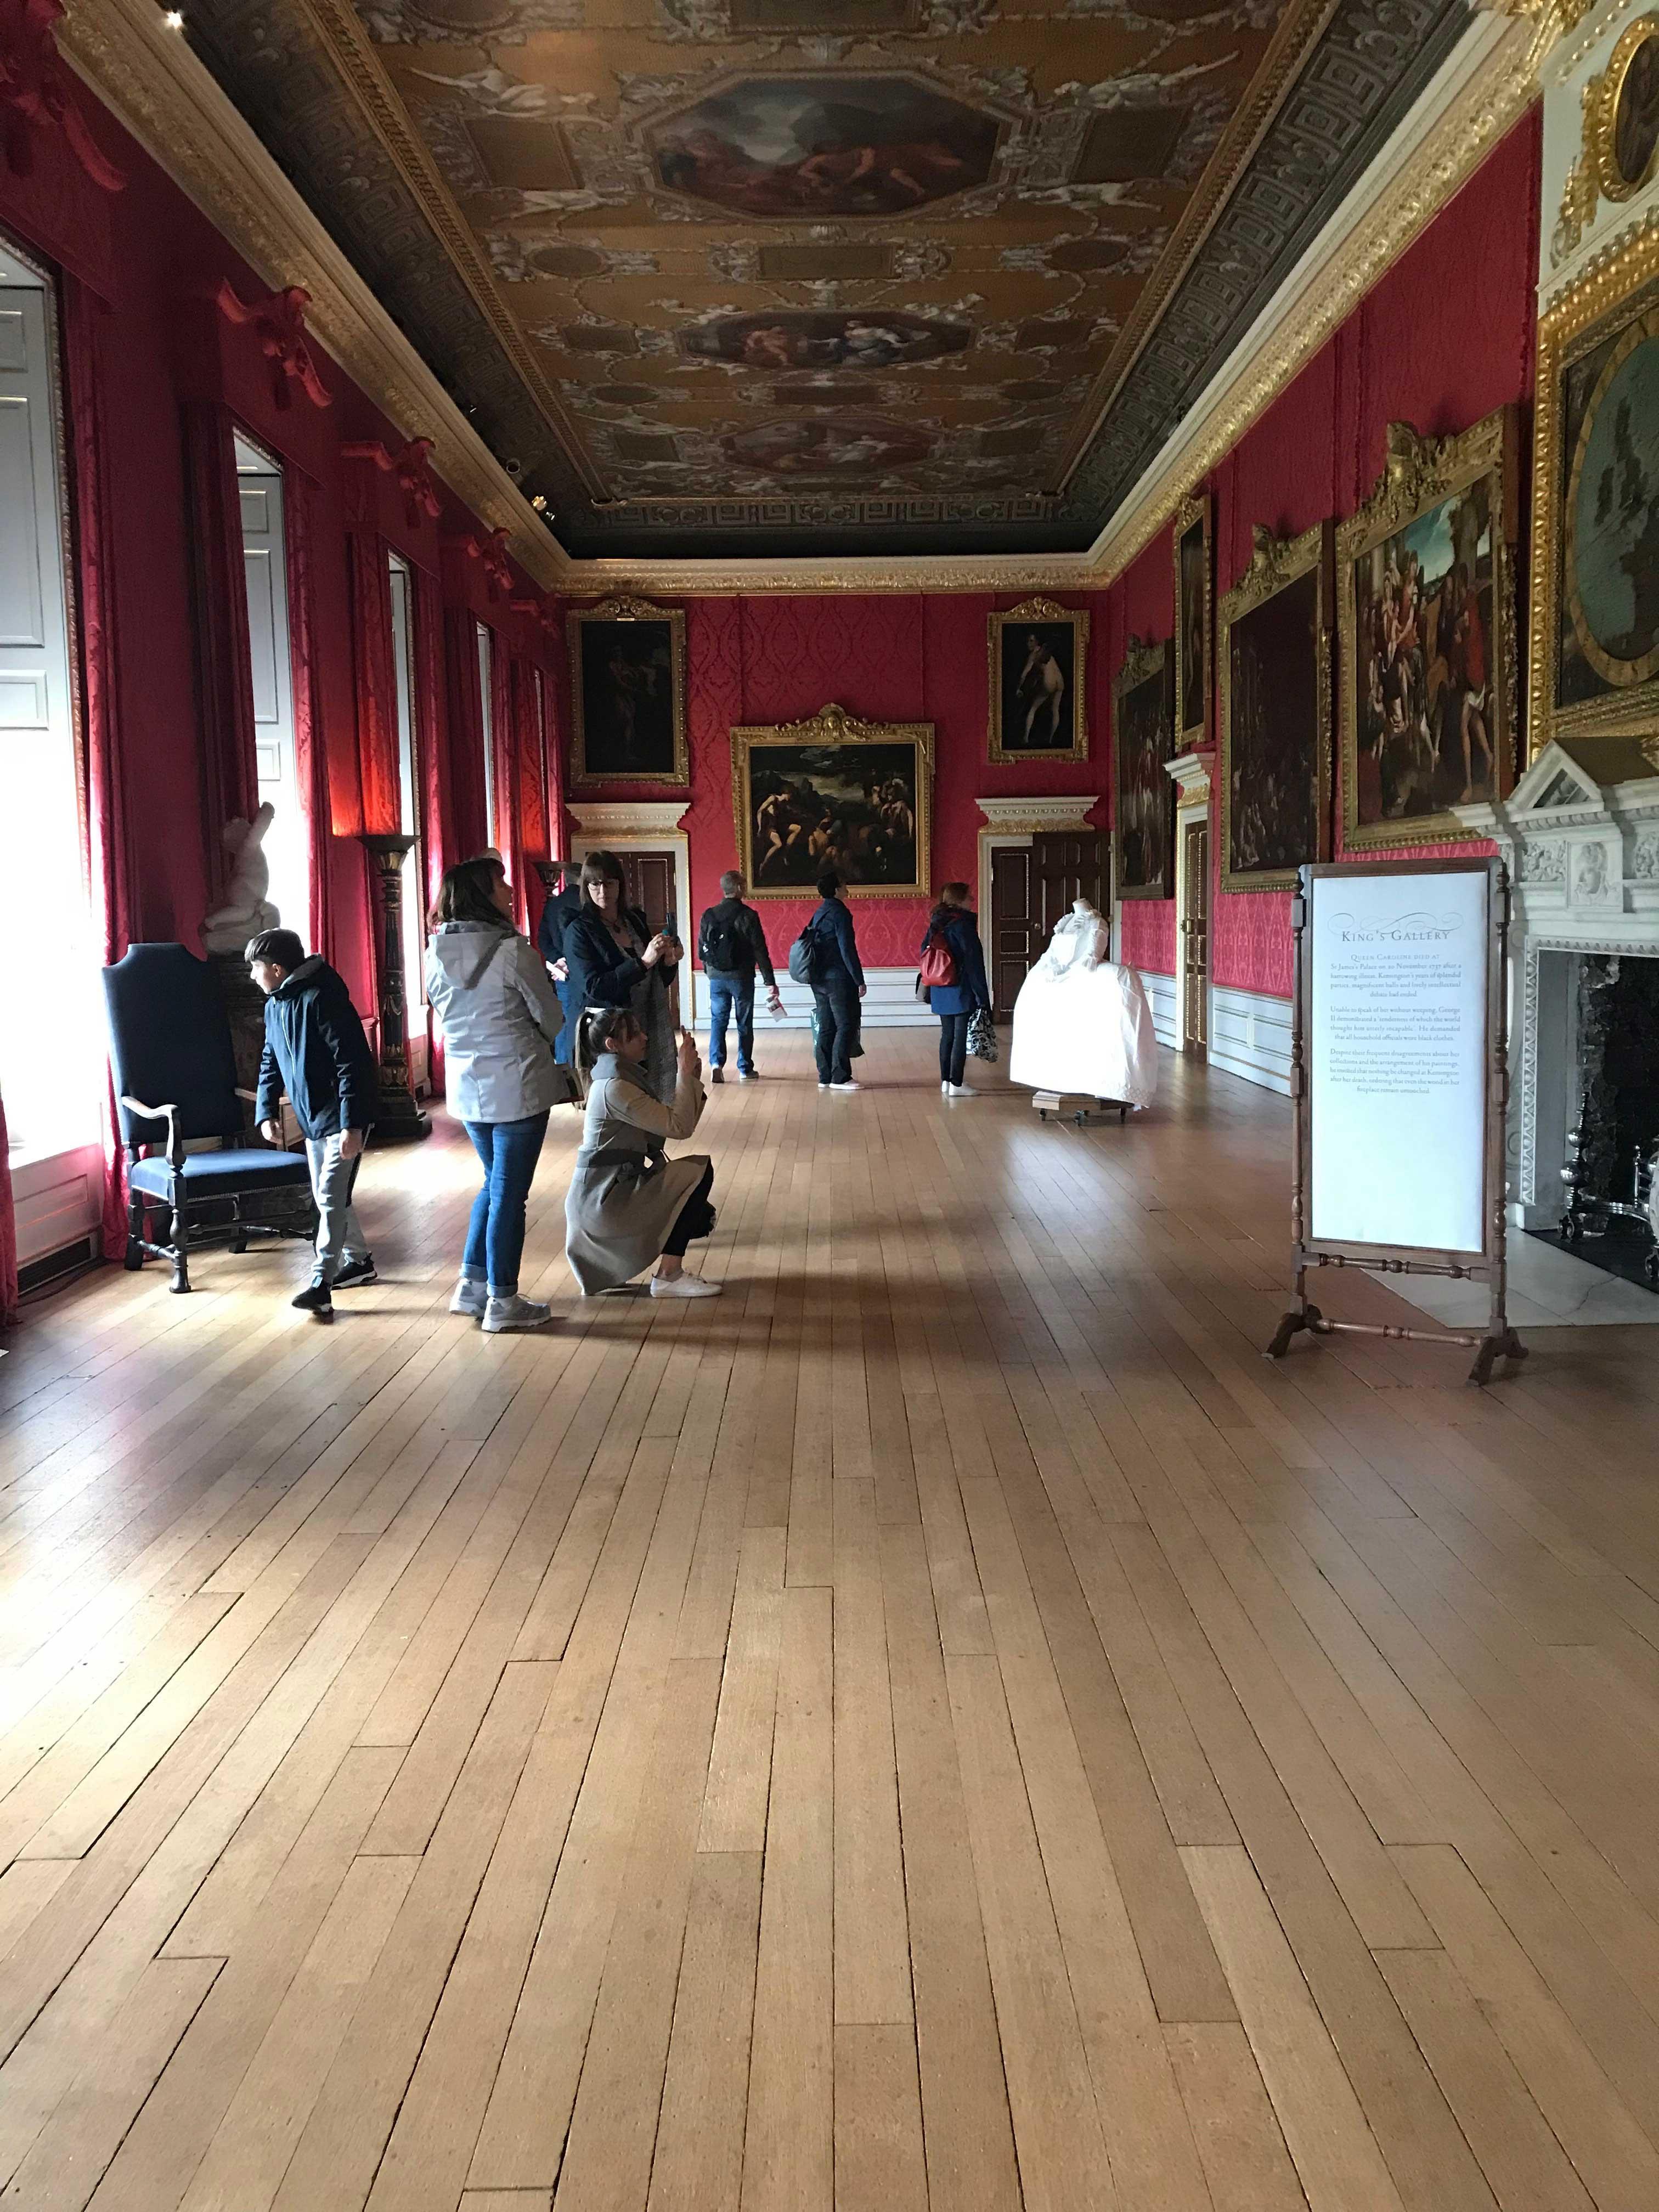 inside kensington palace best interior designs